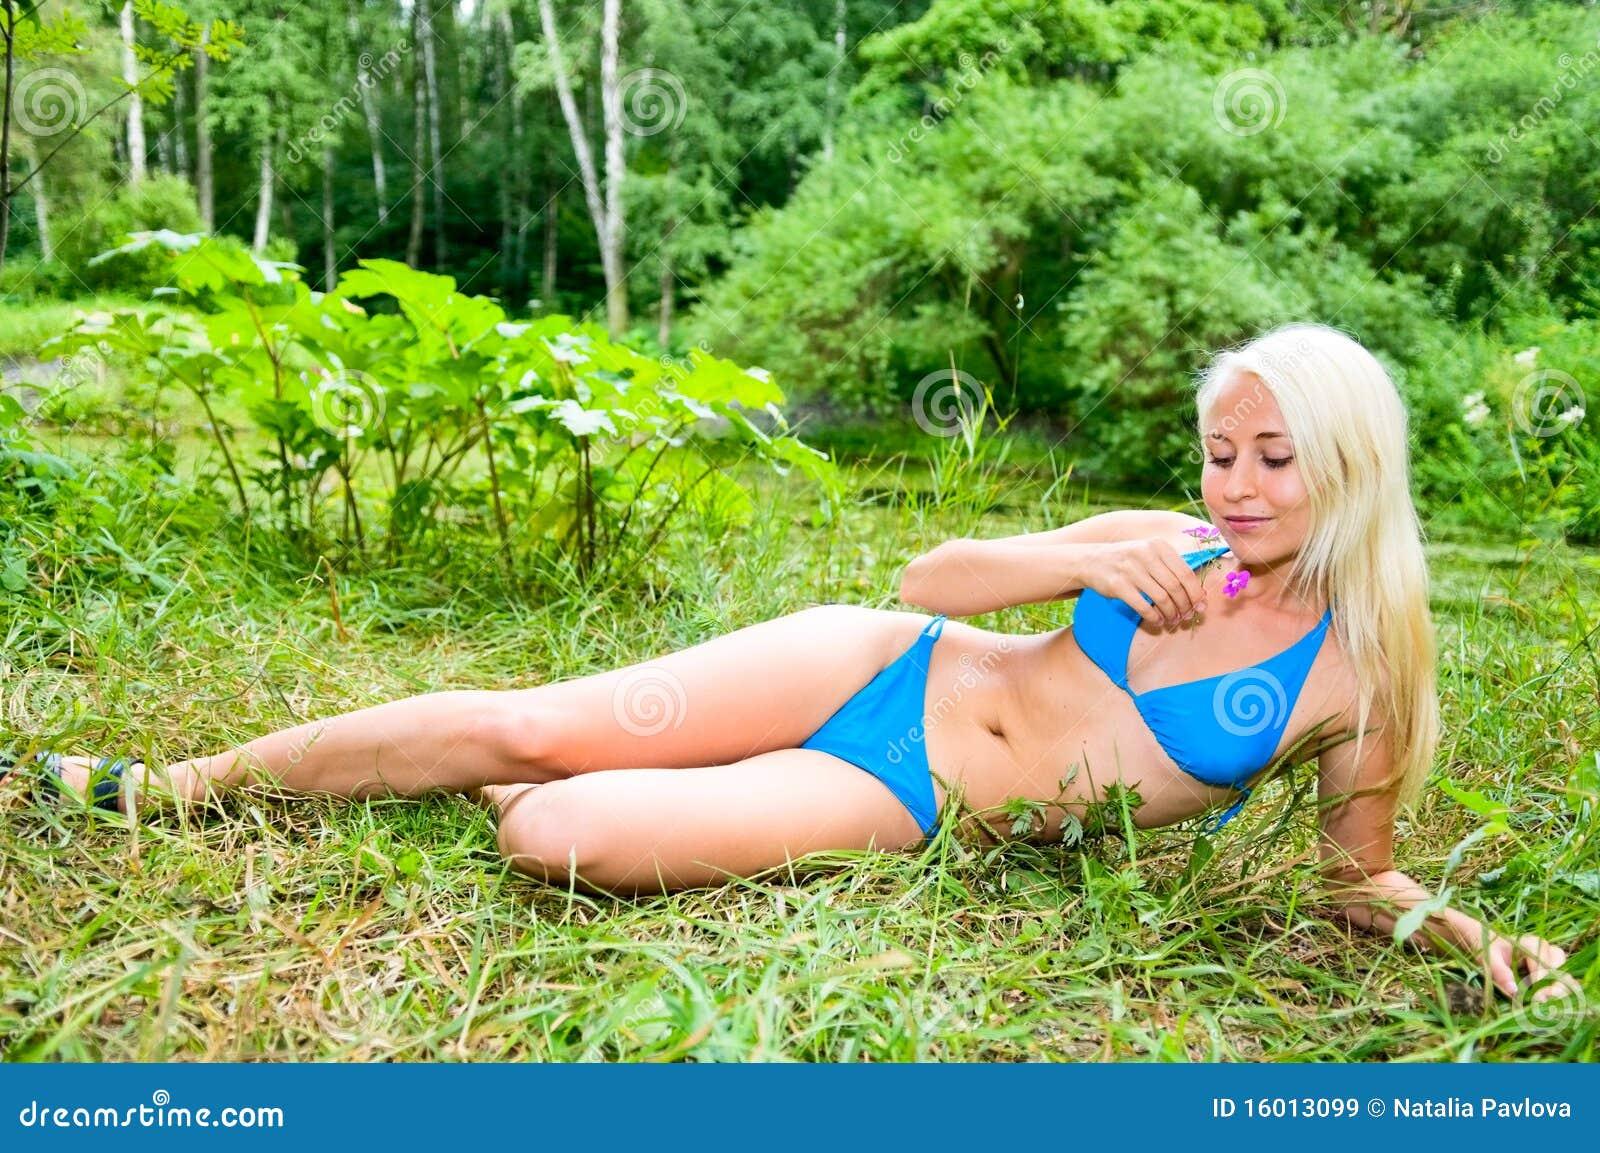 young woman photo nakt bild